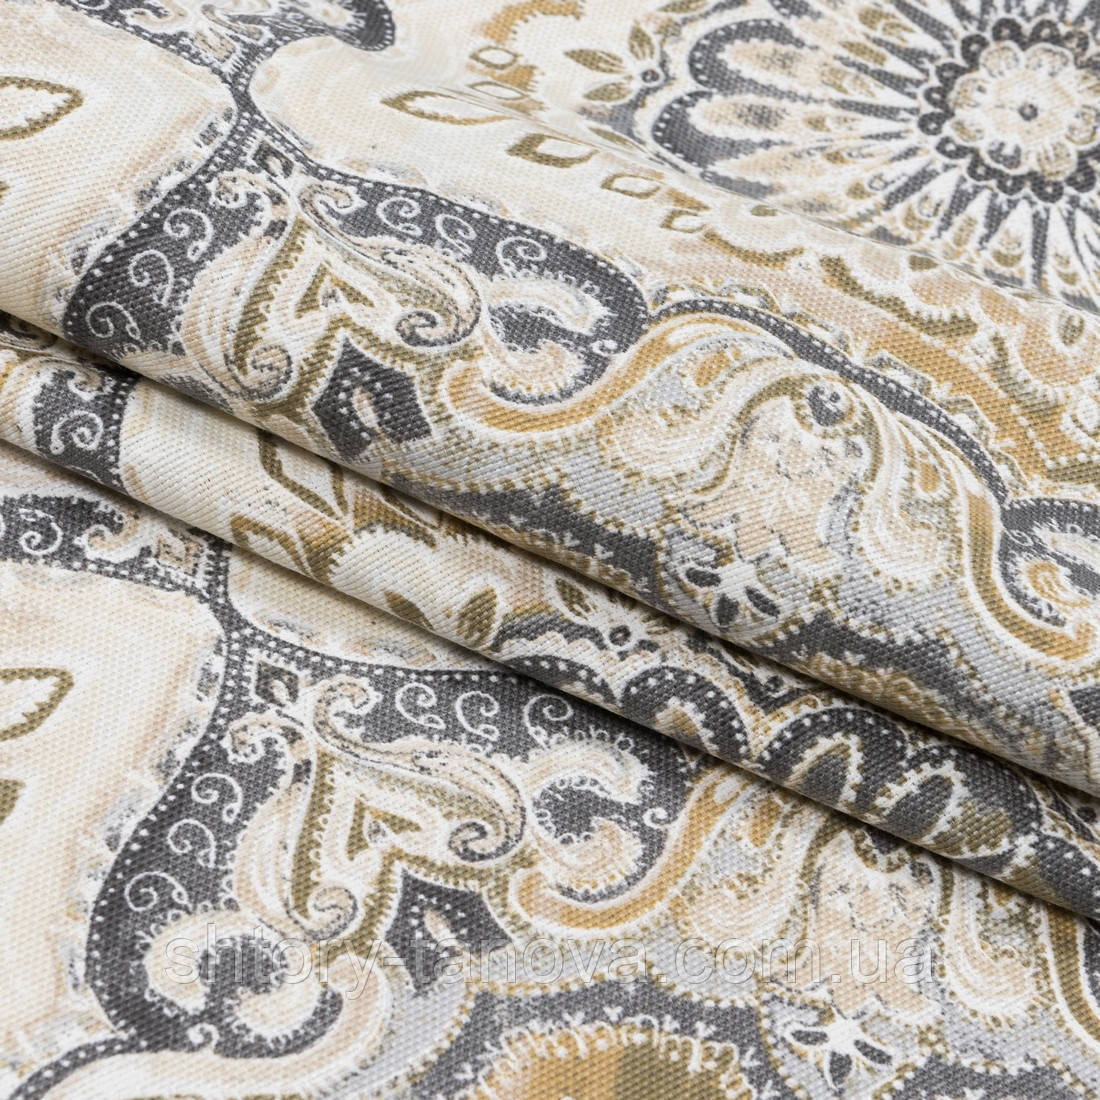 Декоративная ткань панама клейд/ clady серый,оливка